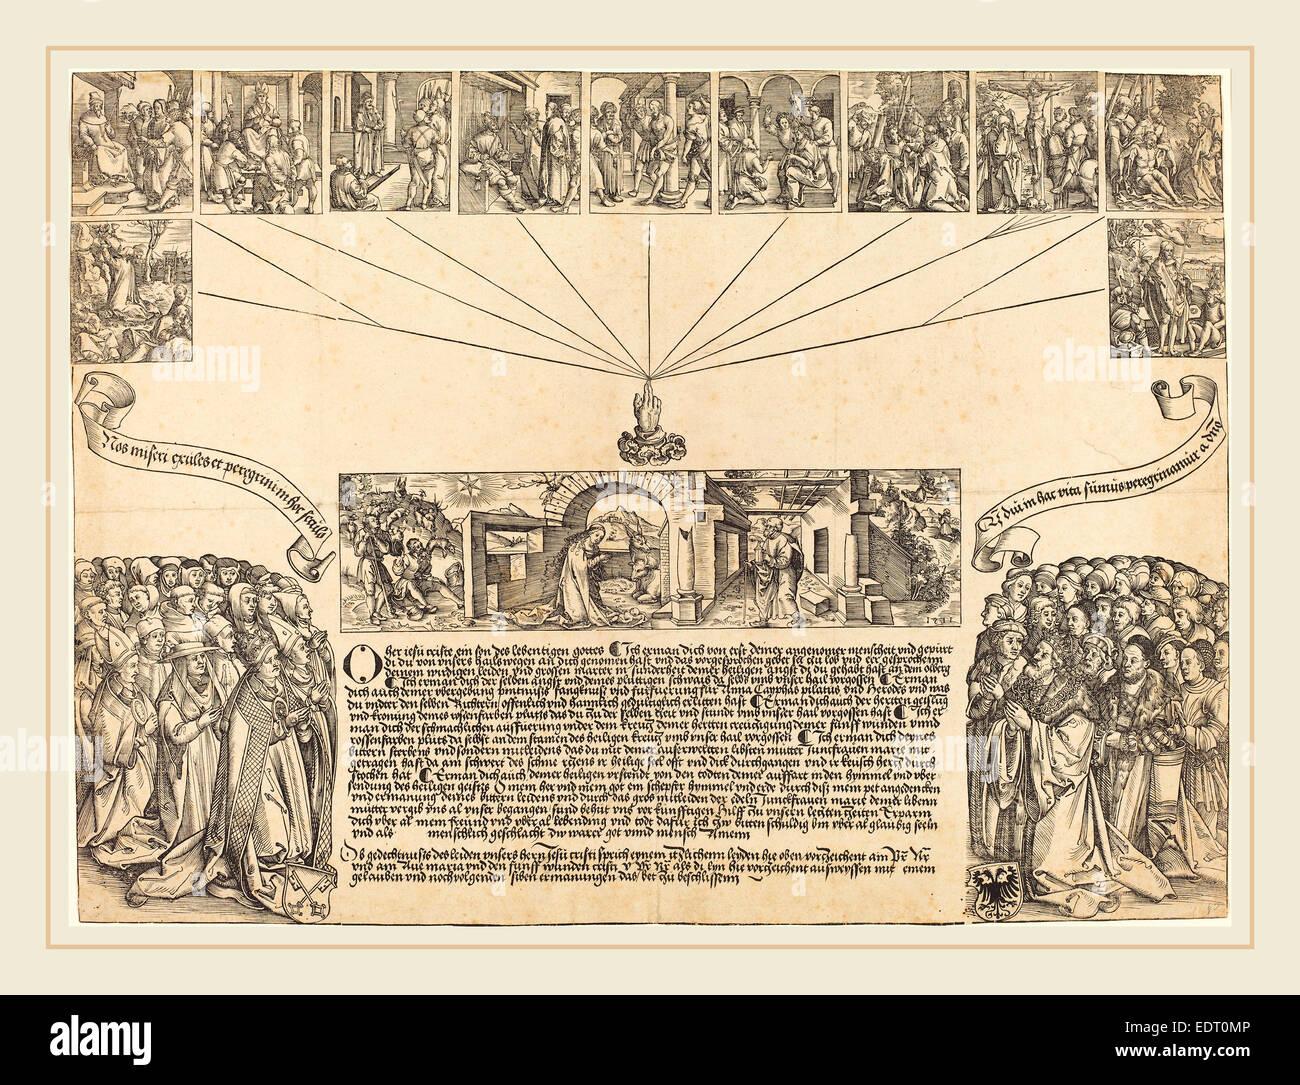 Wolf Traut (German, c. 1486-1520), The Nativity, woodcut - Stock Image